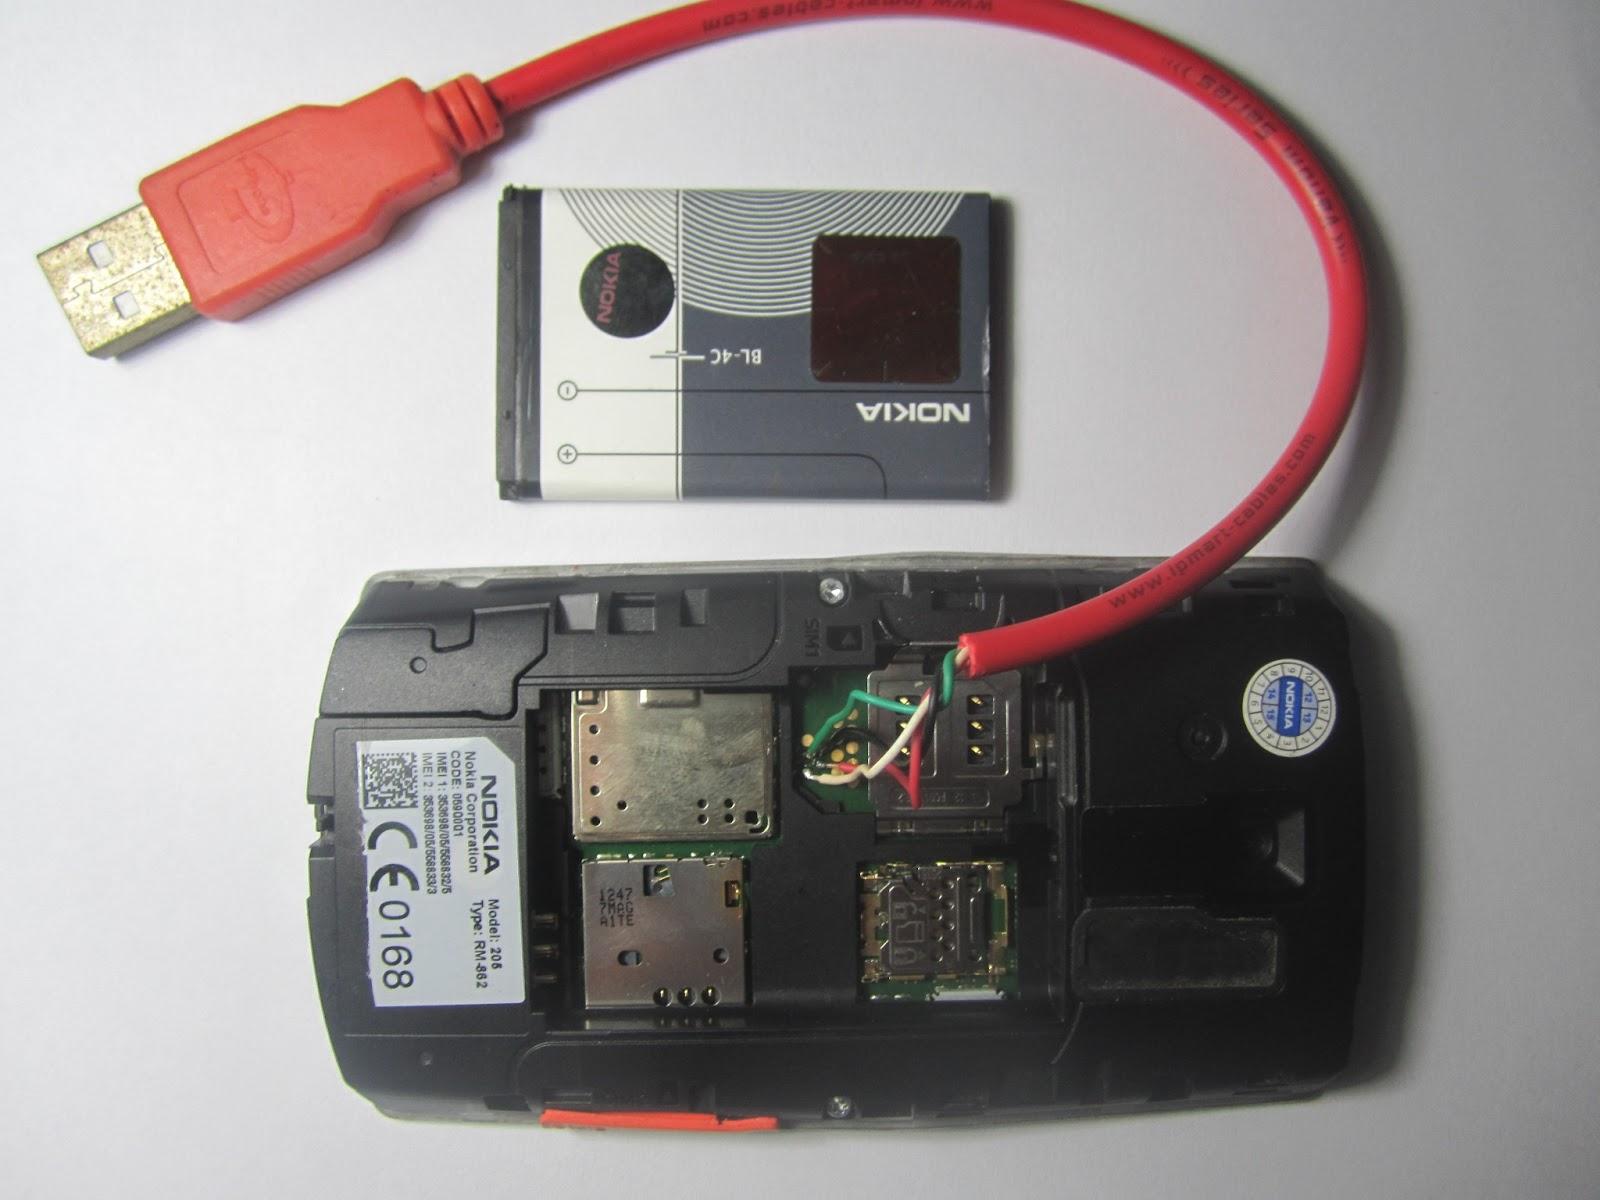 Koleksi Service Handphone Flasing Nokia Asha 205